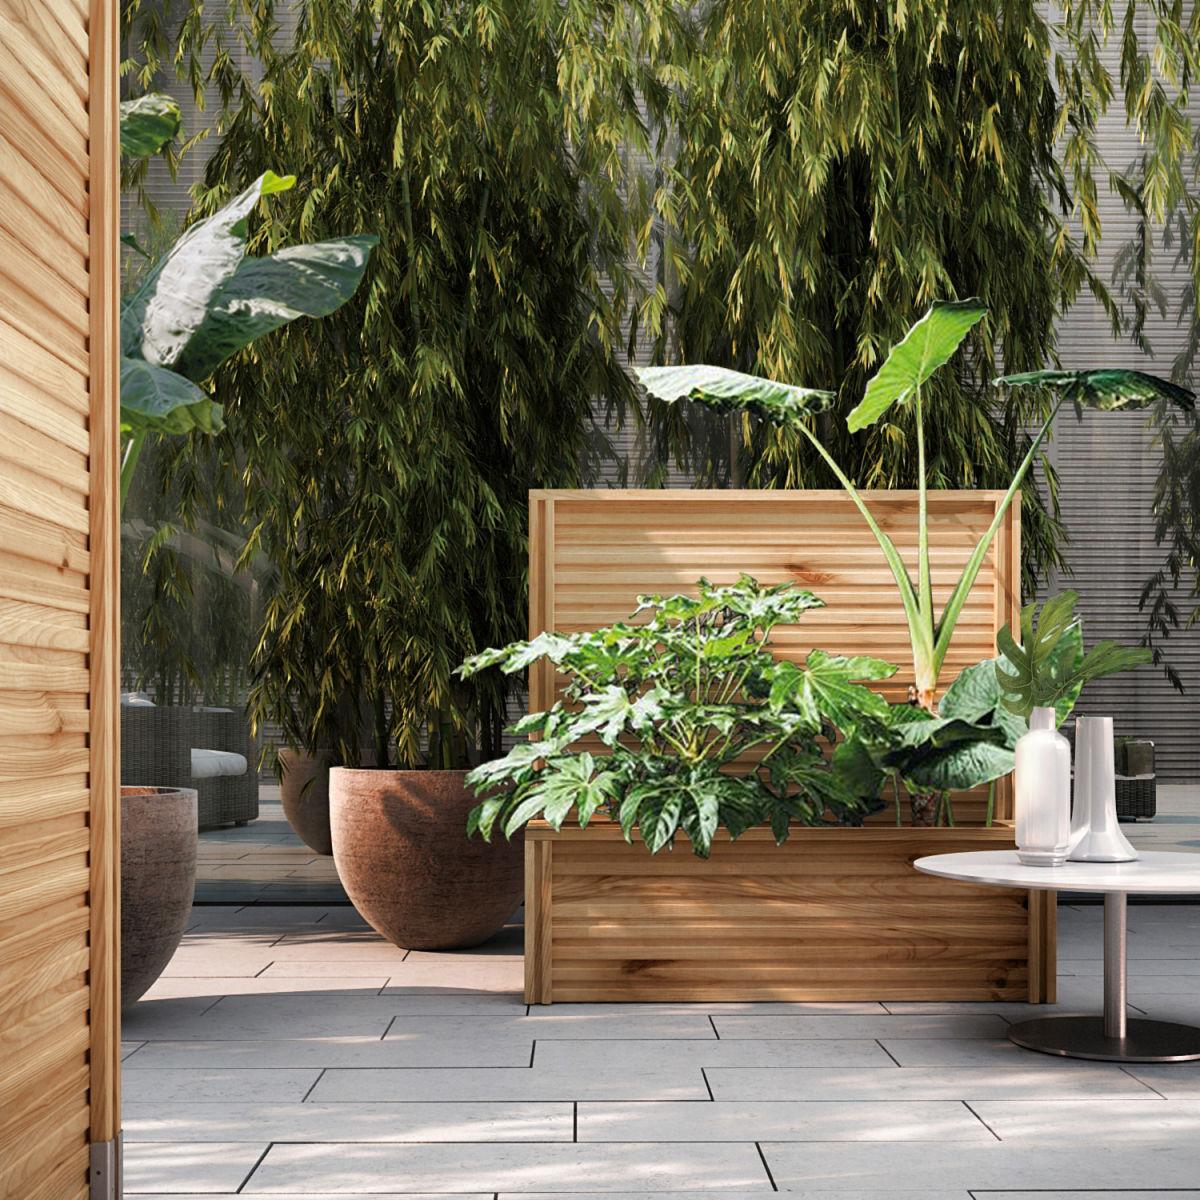 Divisori giardino: prezzi e offerte online per schermi divisori da ...